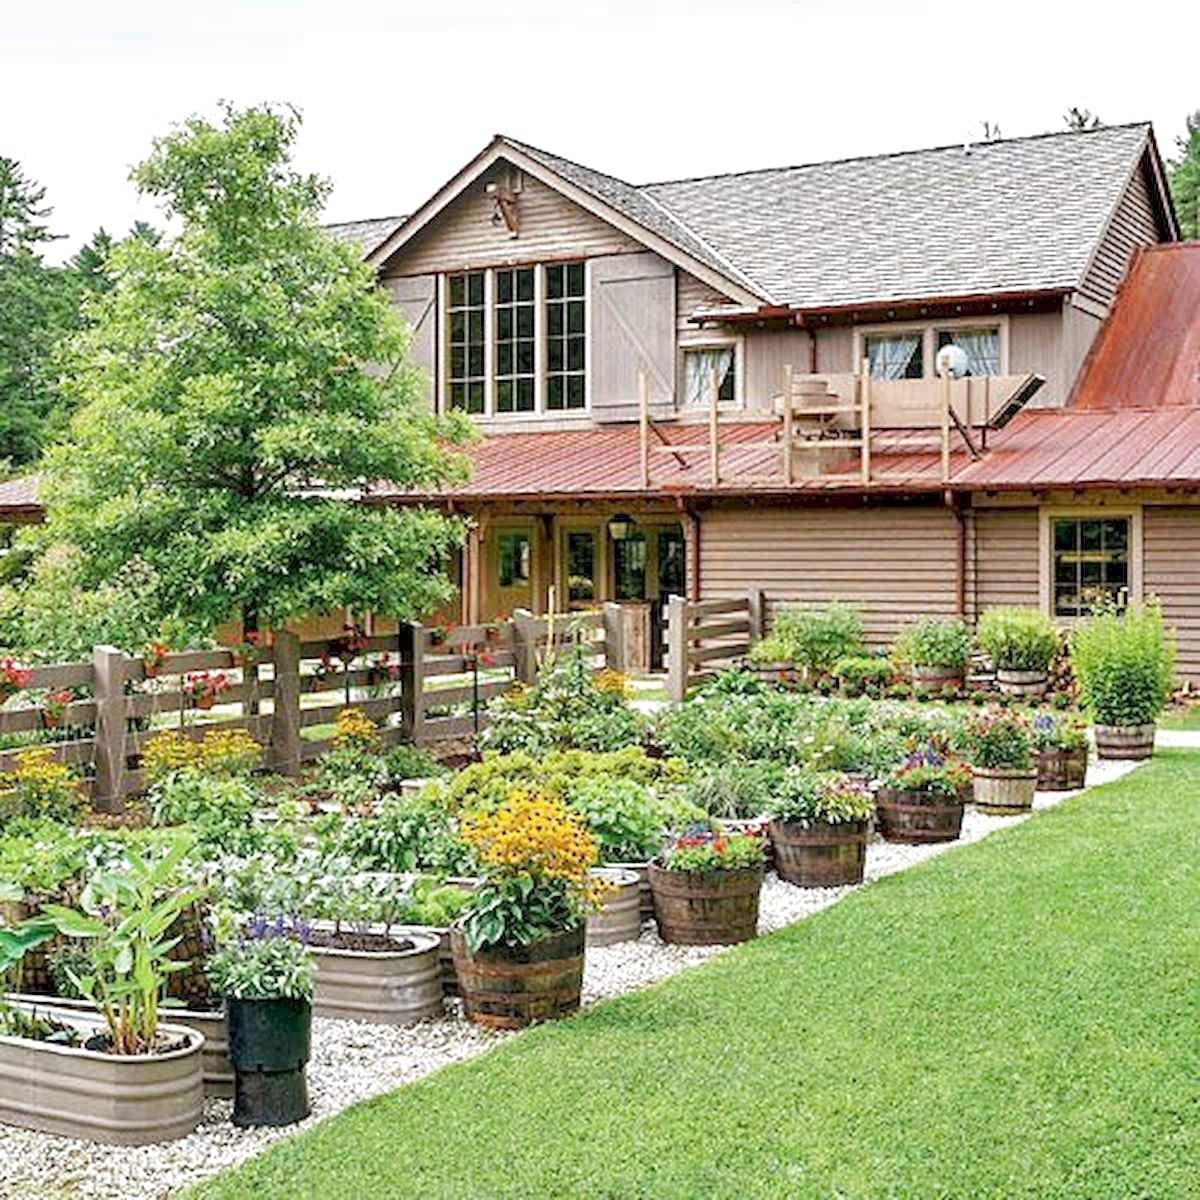 62 Favourite Vegetable Hydroponic Garden Ideas And Decoration The Expert Beautiful Ideas Backyard Landscaping Garden Landscape Design Rock Garden Landscaping